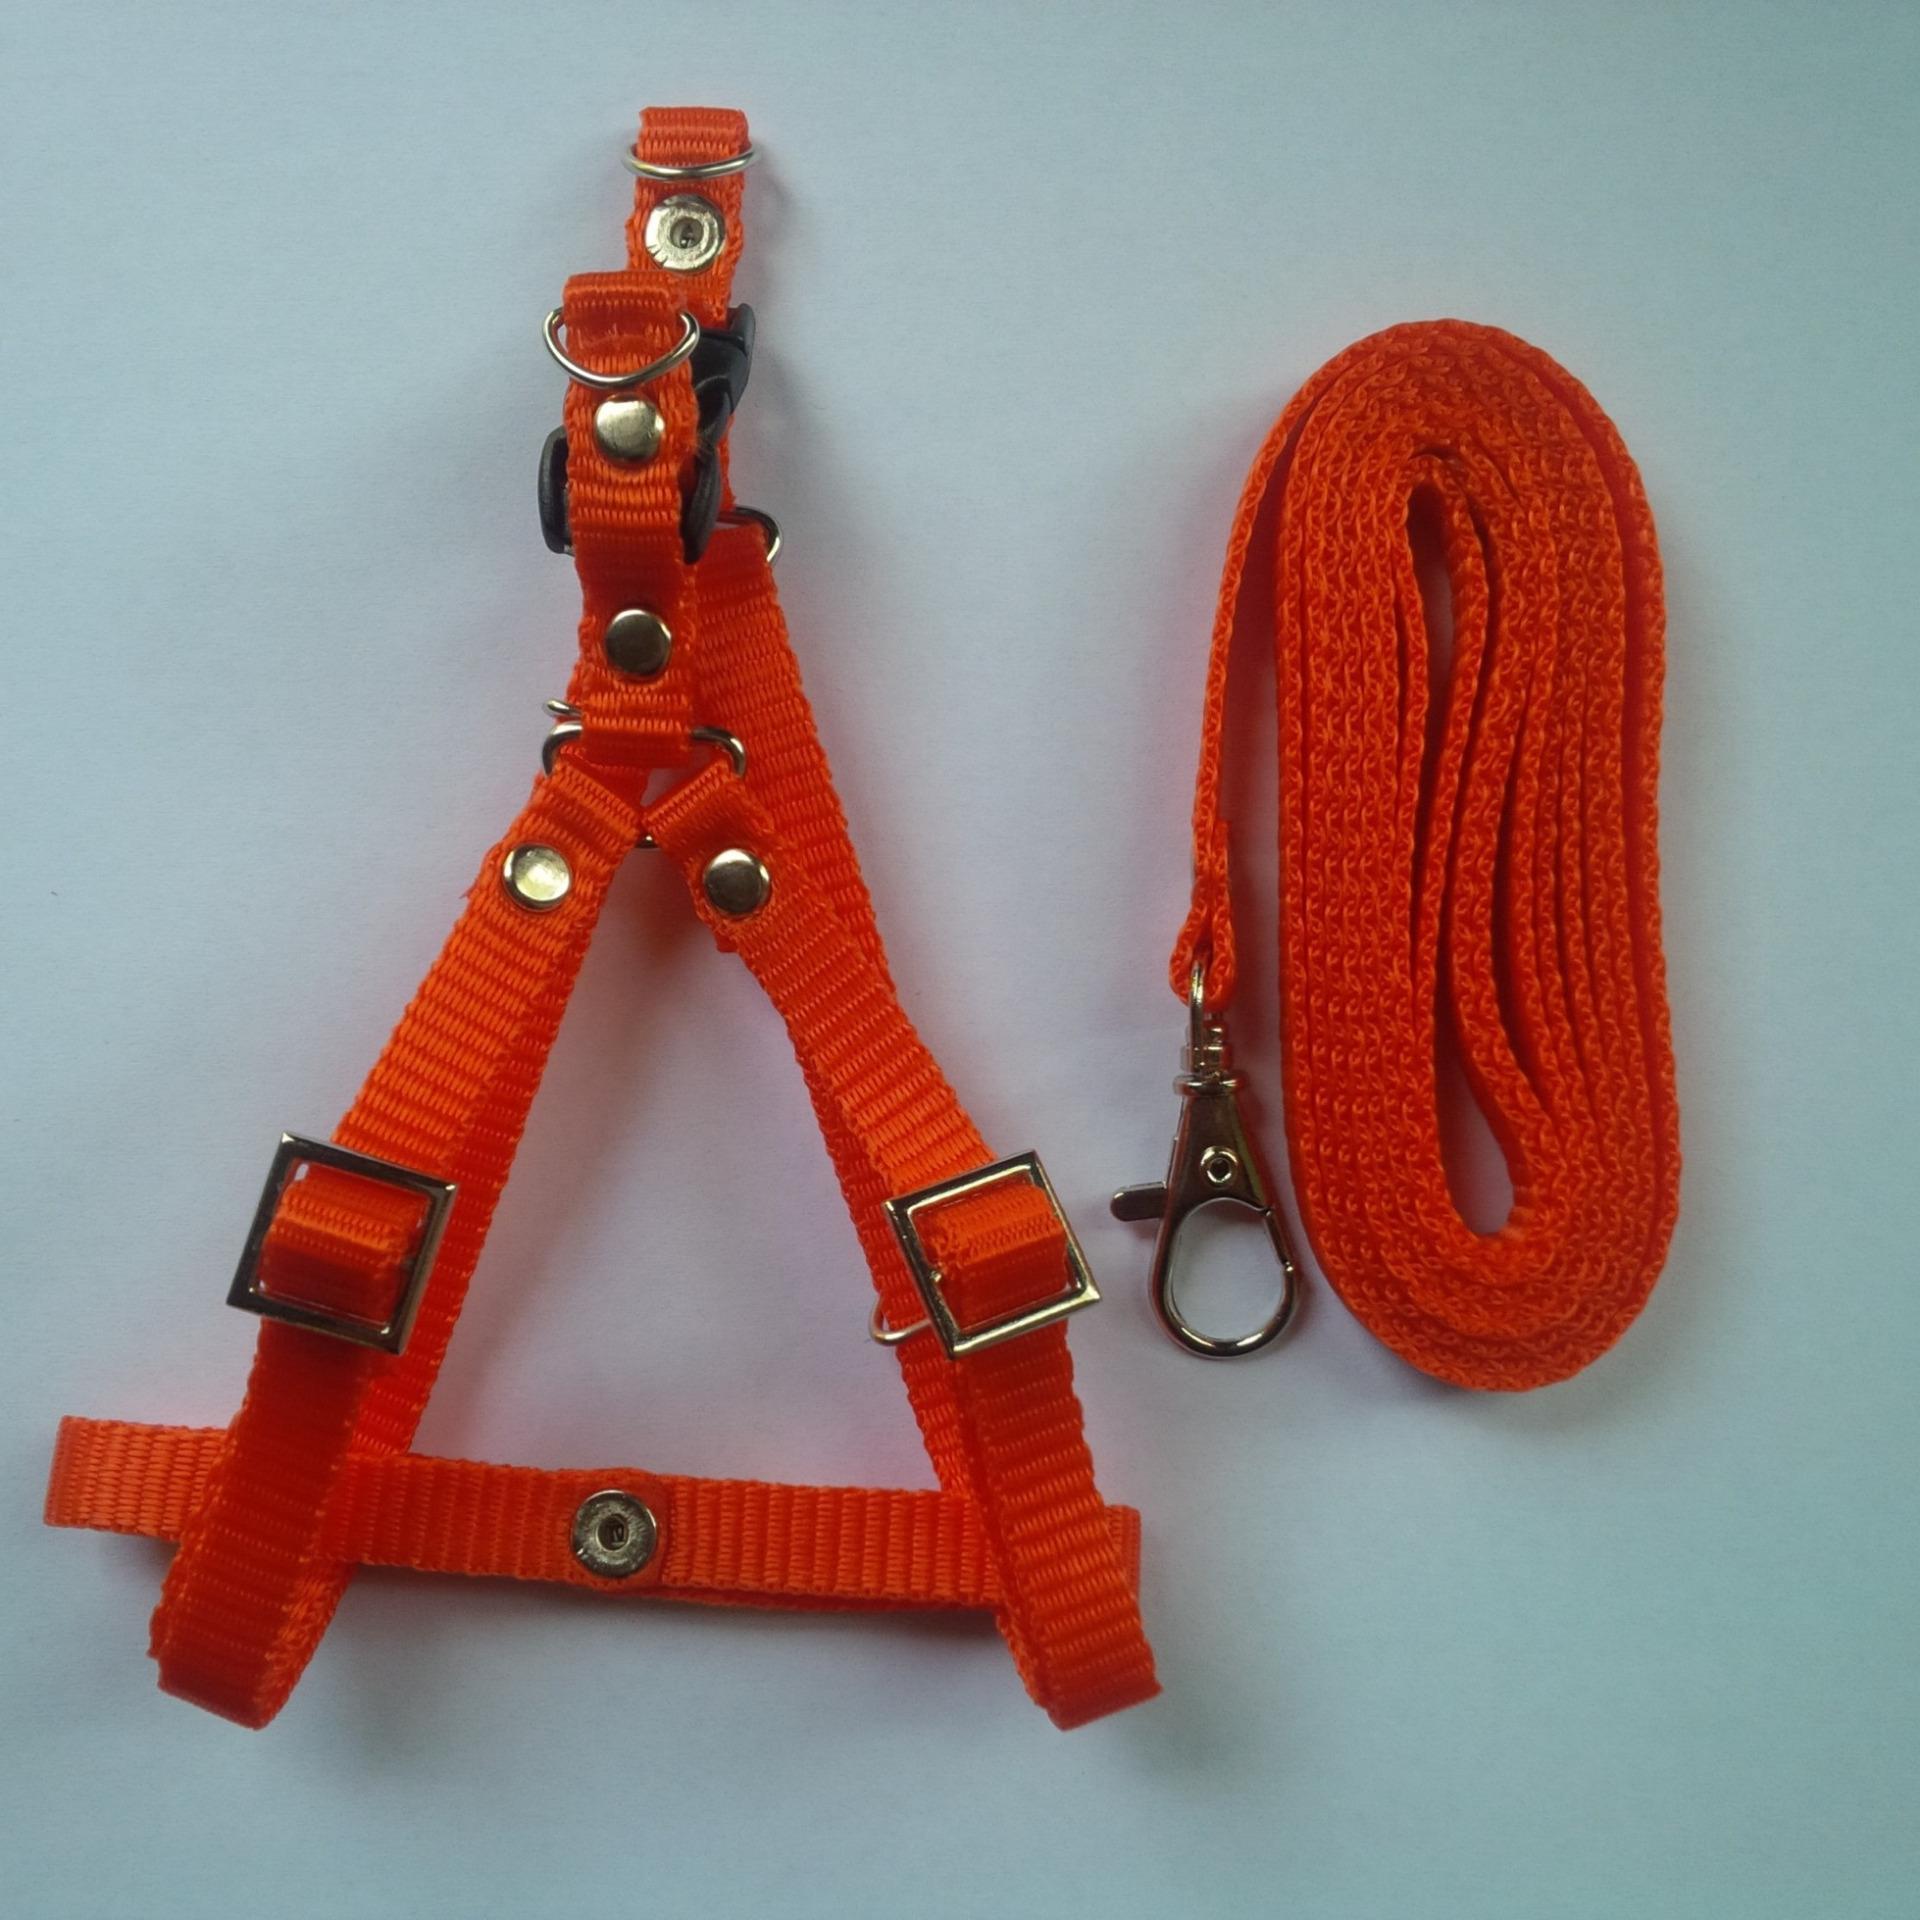 Harness Y uk S + Leash Orange untuk Kucing, Kelinci, Musang .